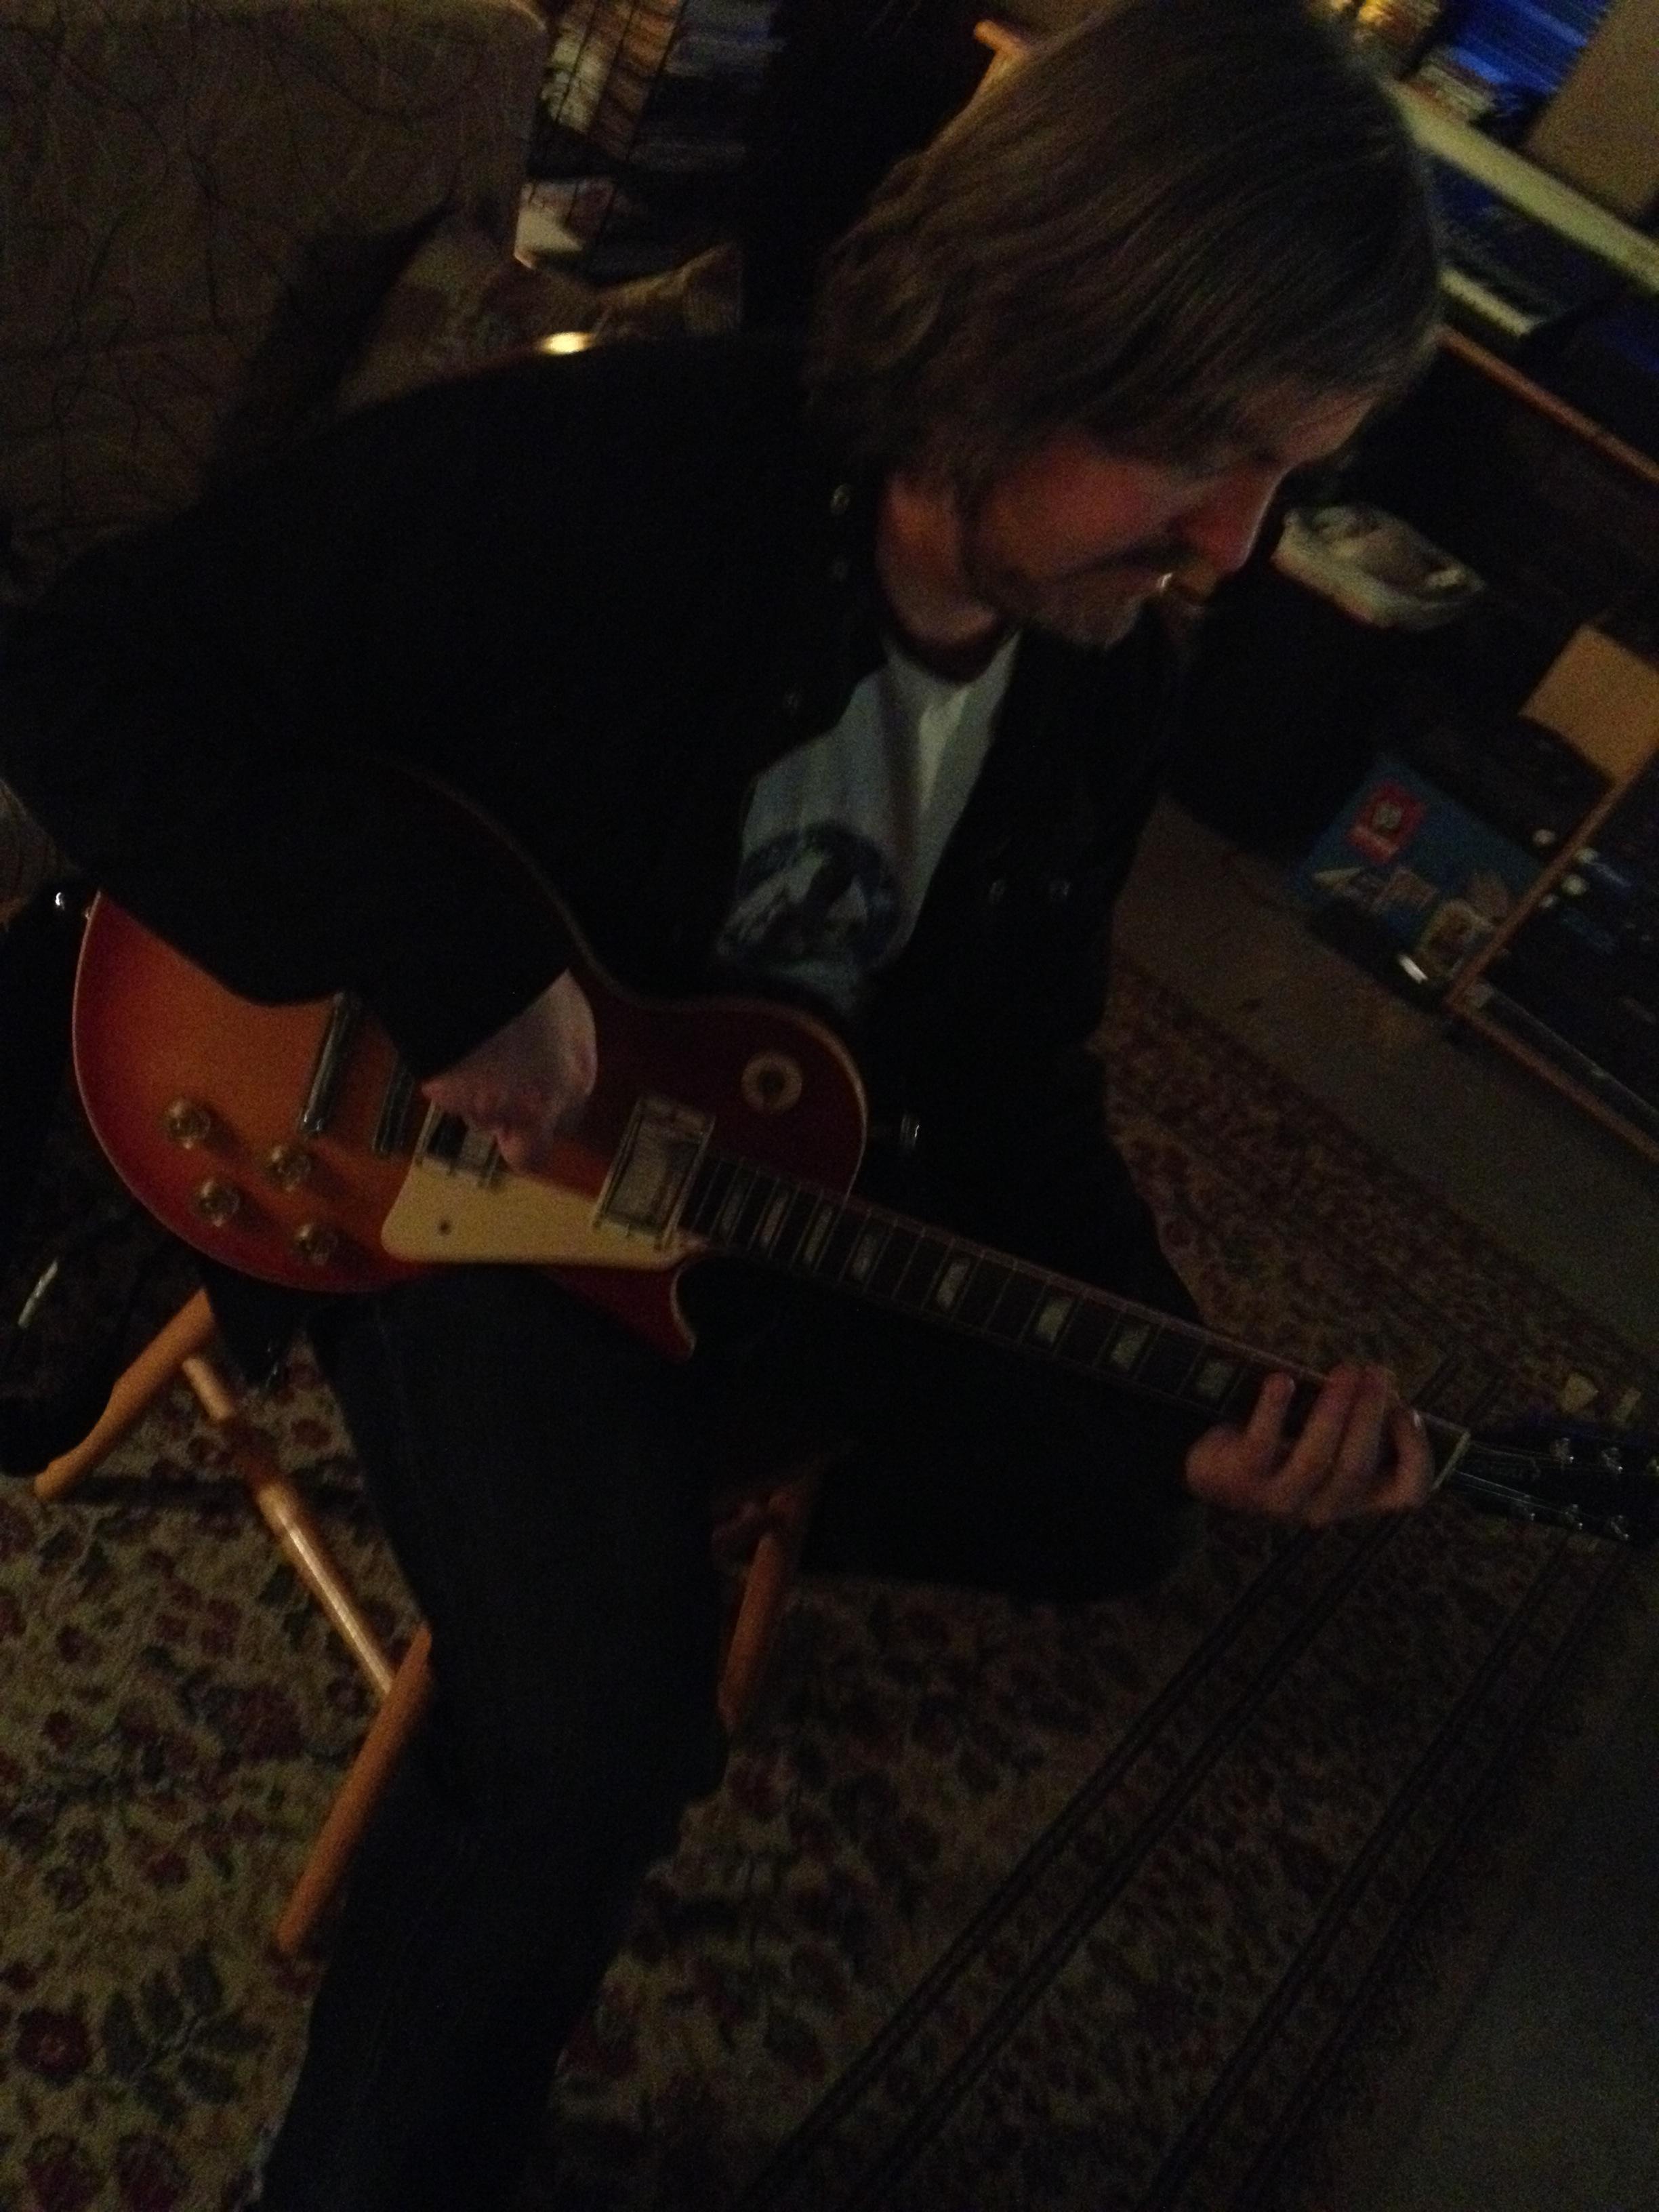 tom guitar2.jpg